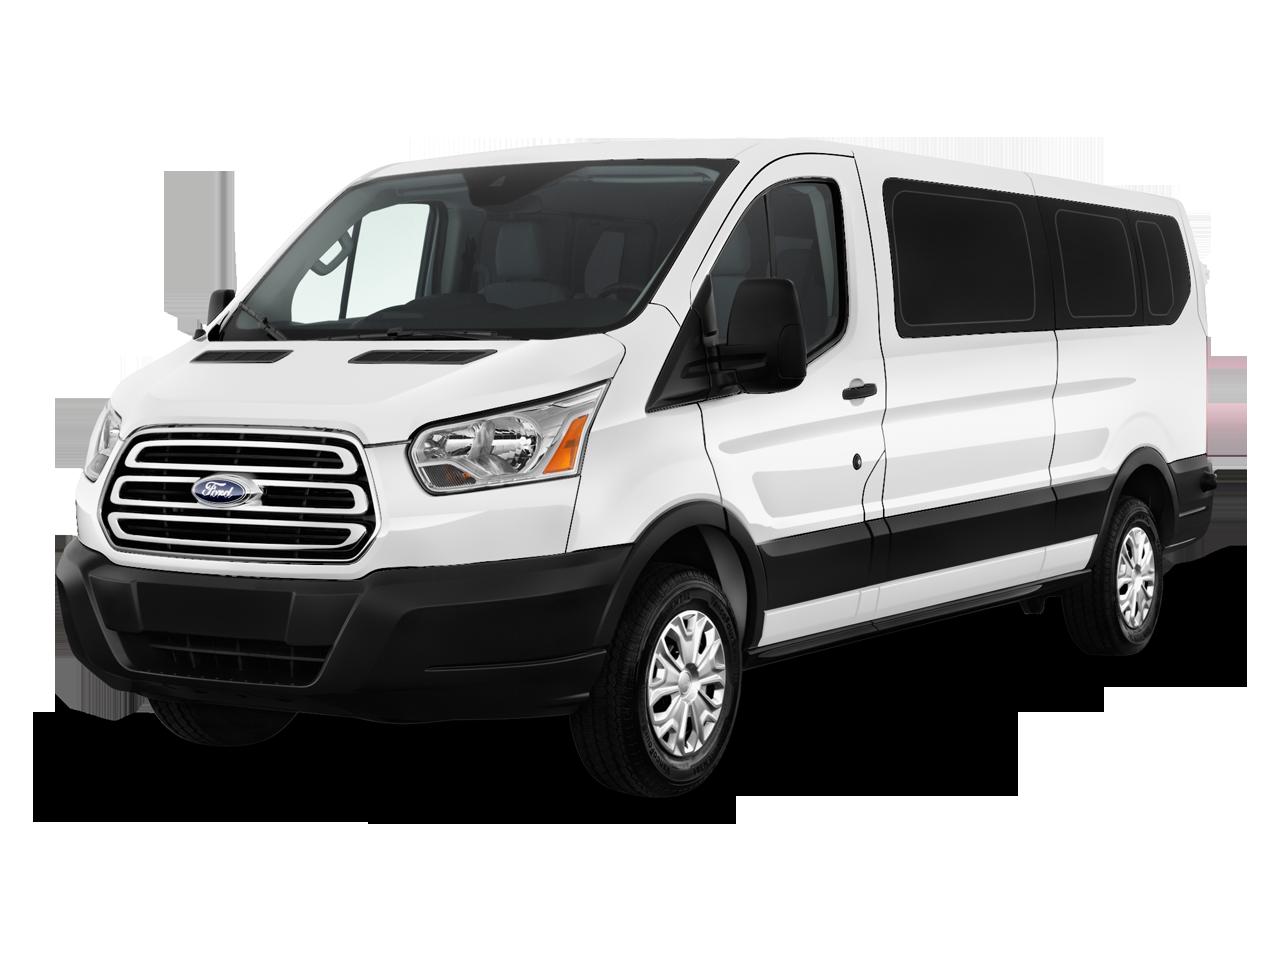 new 2016 ford transit wagon xl near tulsa ok bob hurley ford. Black Bedroom Furniture Sets. Home Design Ideas